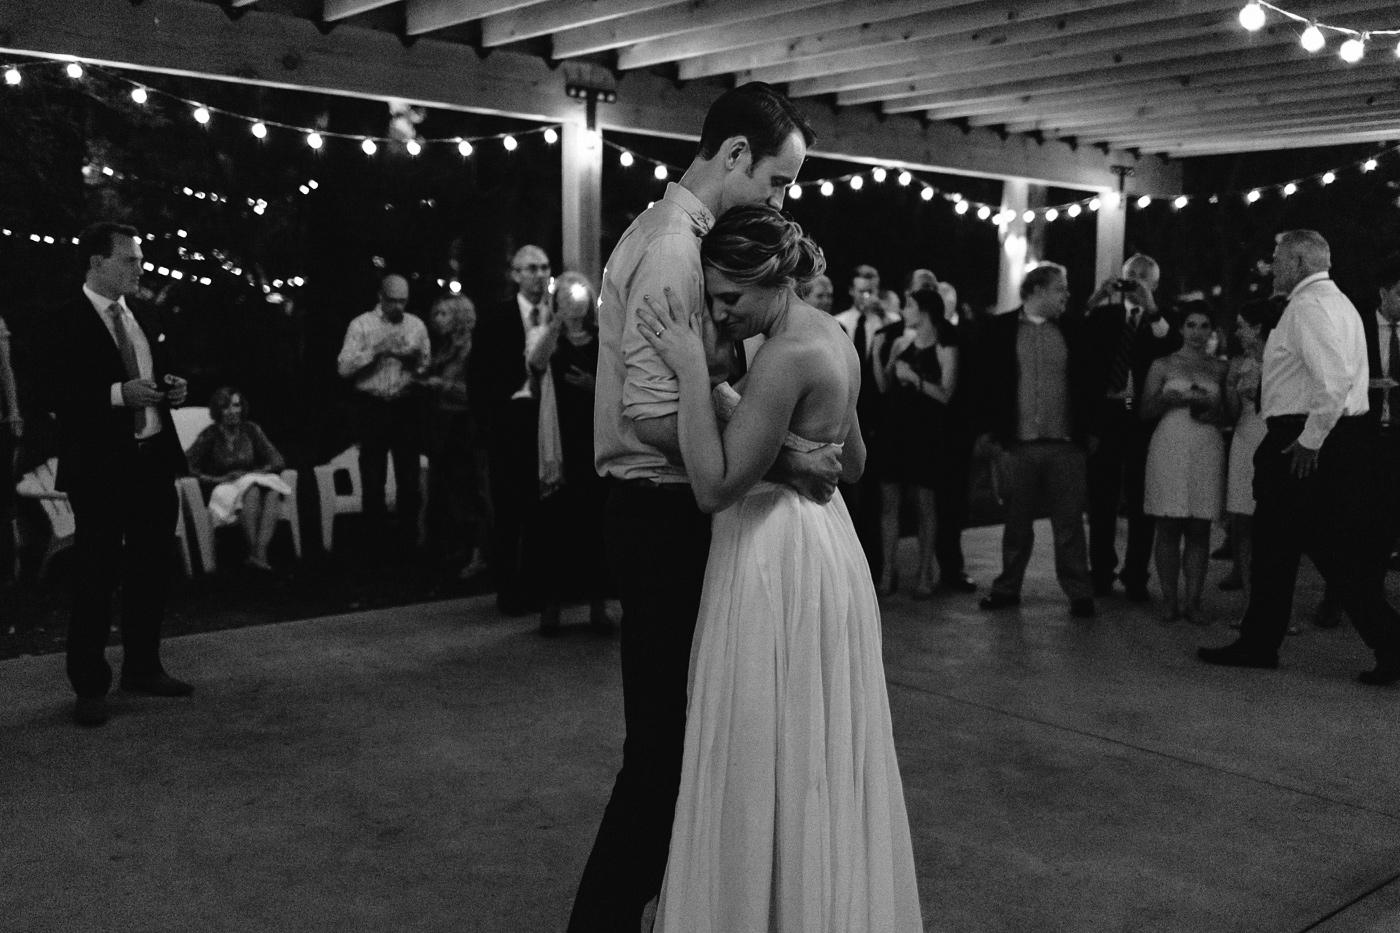 Lyons-Farmette-Wedding-Photographer-Lucy-Austin-Flash-Mob-Dance-73.jpg